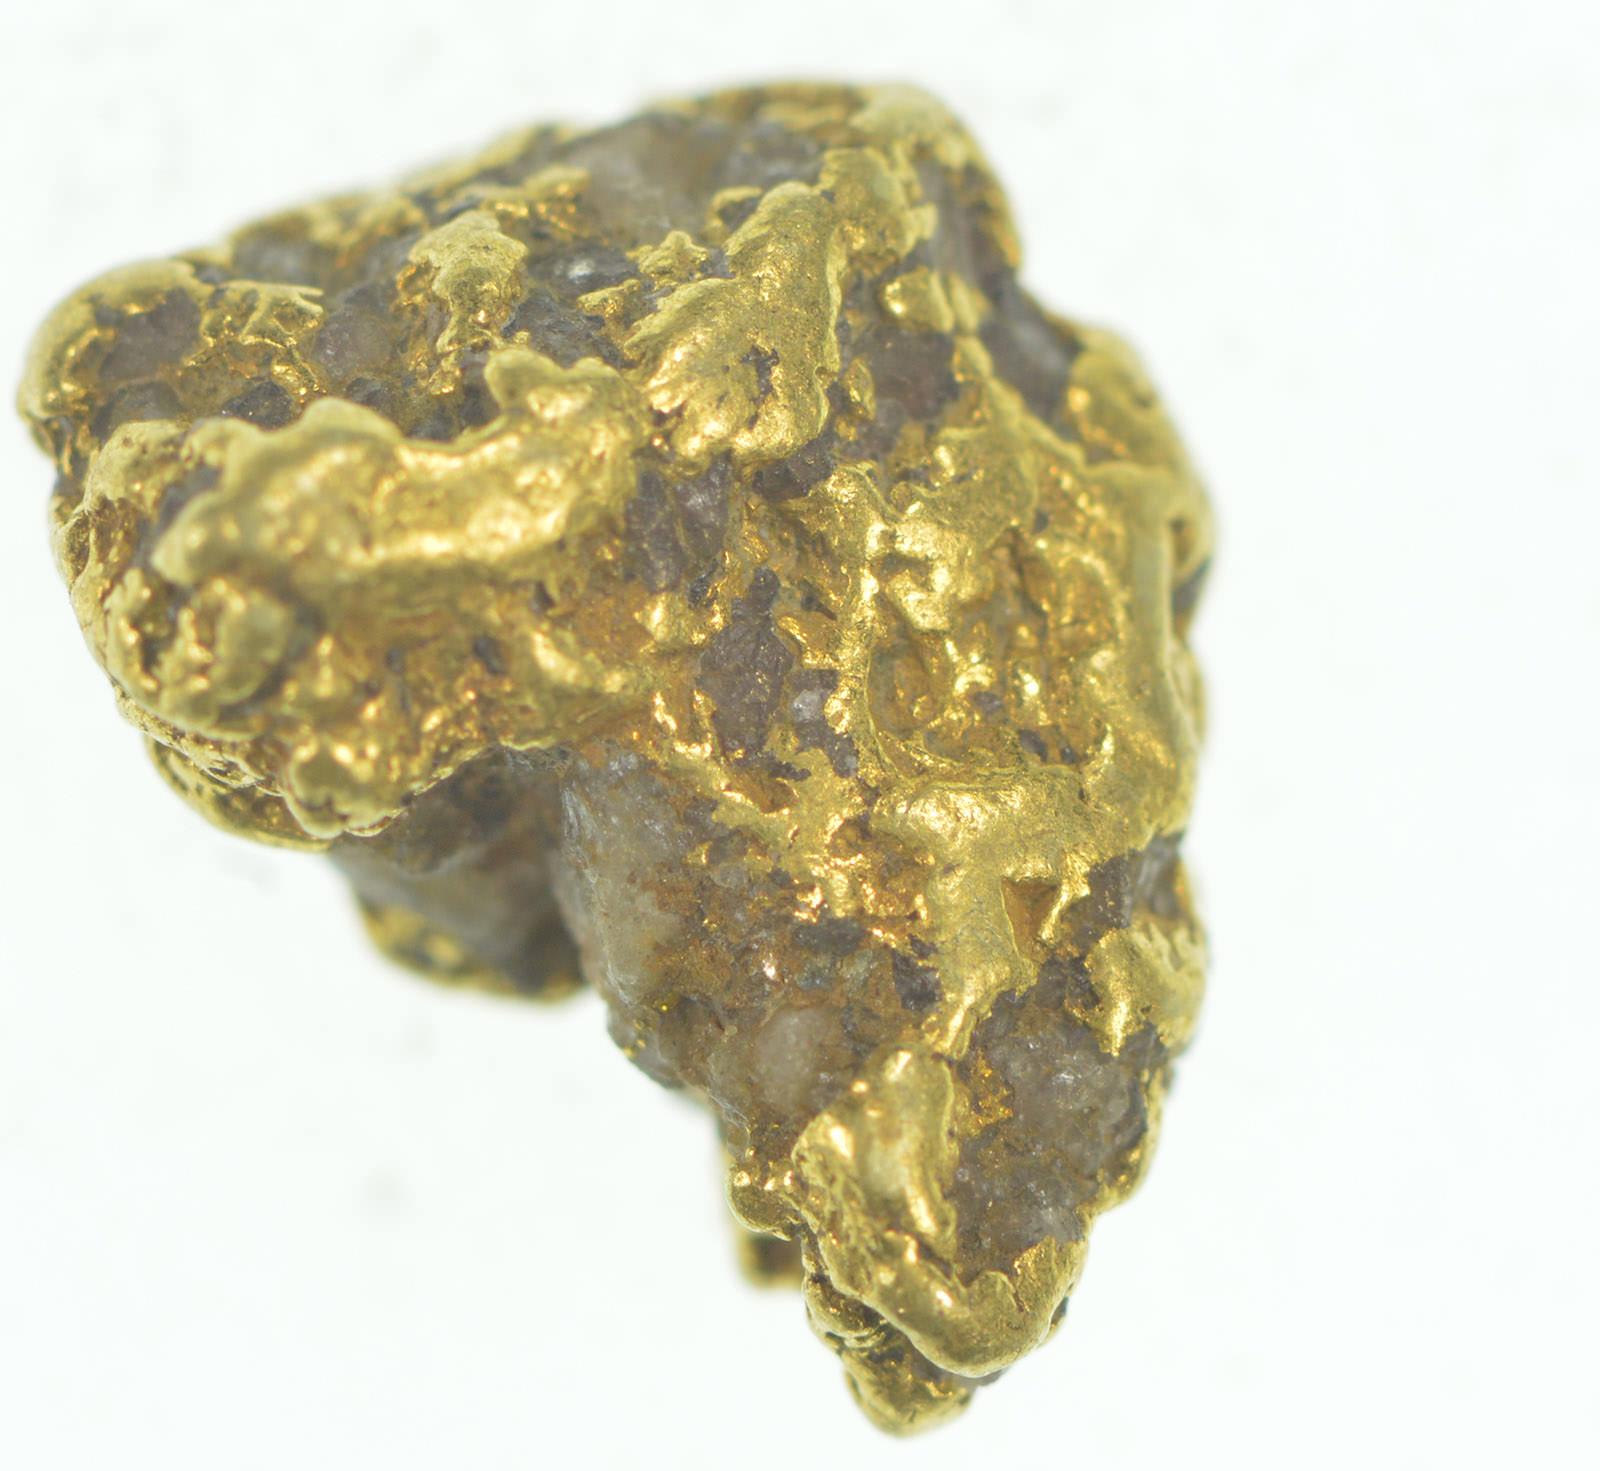 Gold Rush - Idaho Gold Nugget - Raw High Karat - 2 7g